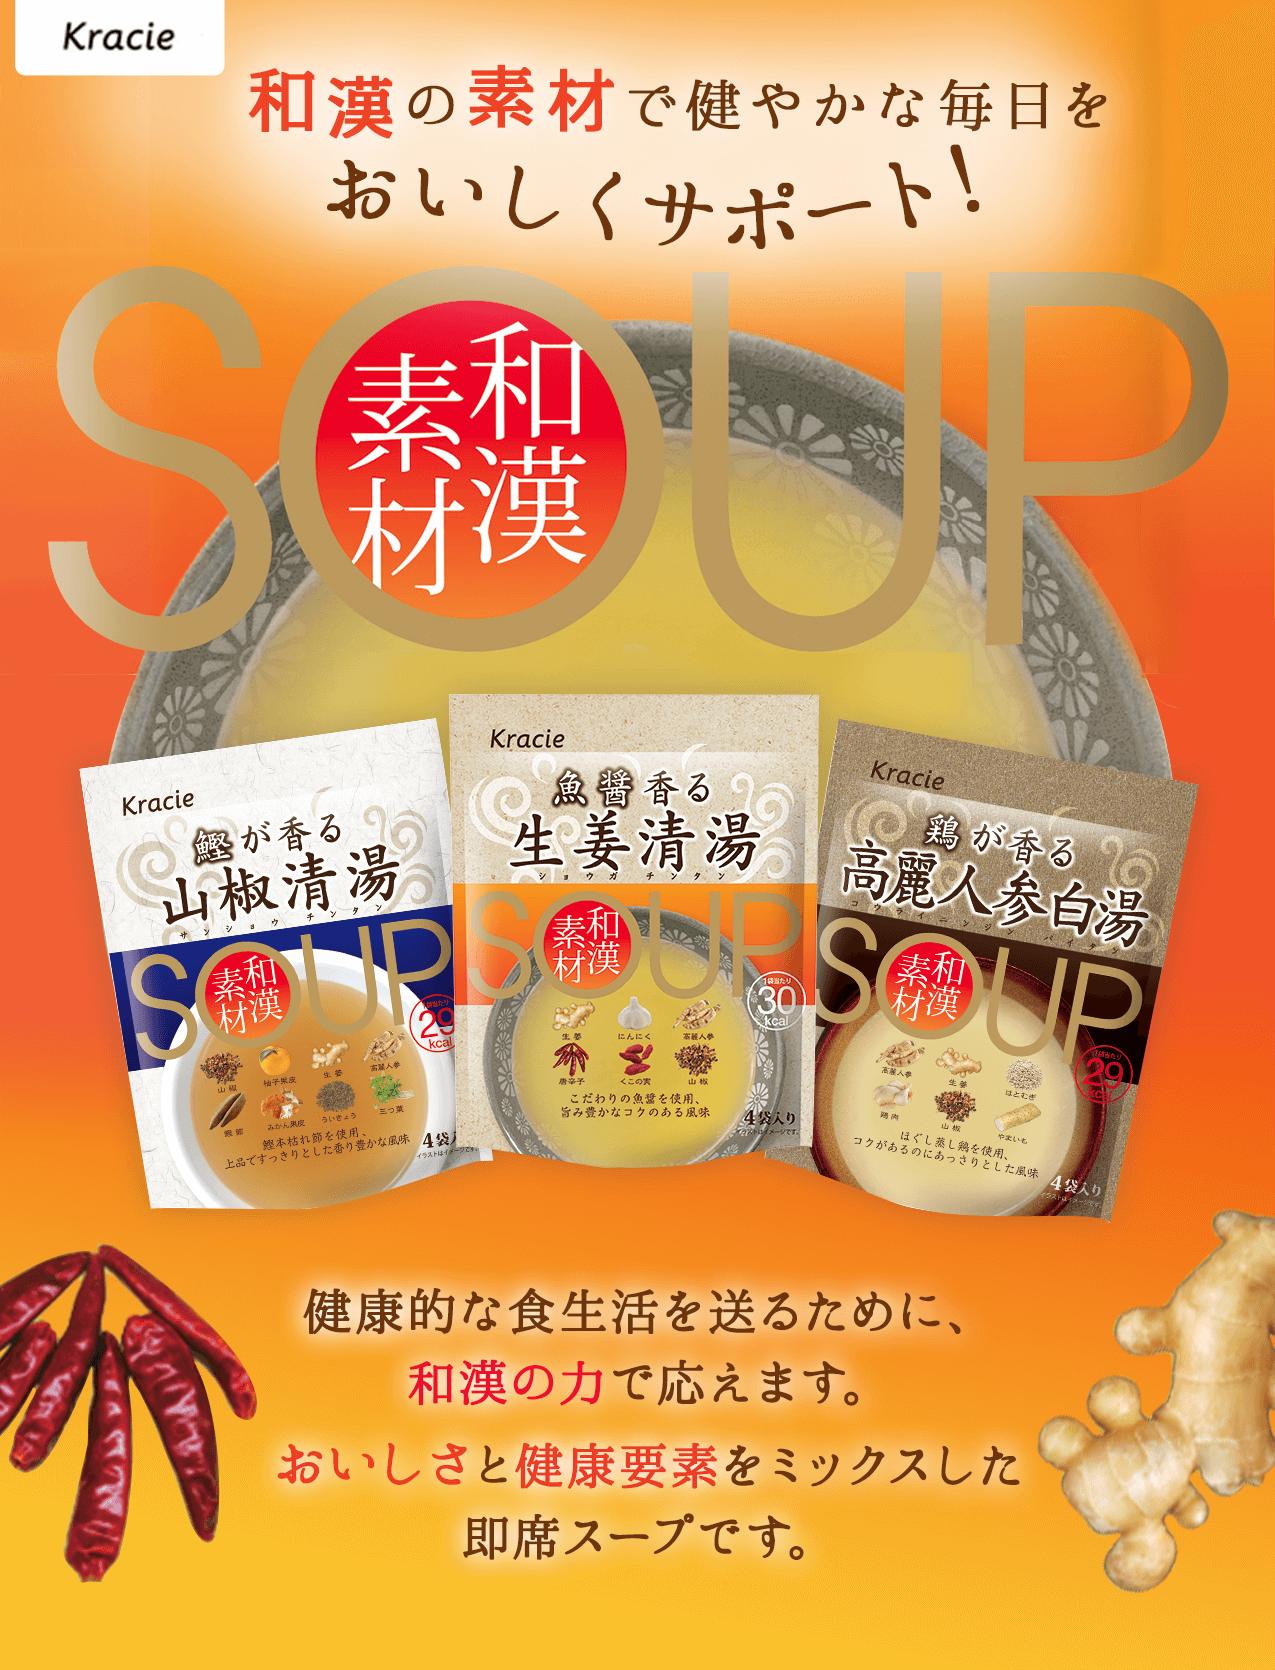 Kracie 和漢の素材で健やかな毎日をおいしくサポート! 和漢素材 健康的な食生活を送るために、和漢の力で応えます。おいしさと健康要素をミックスした即席スープです。